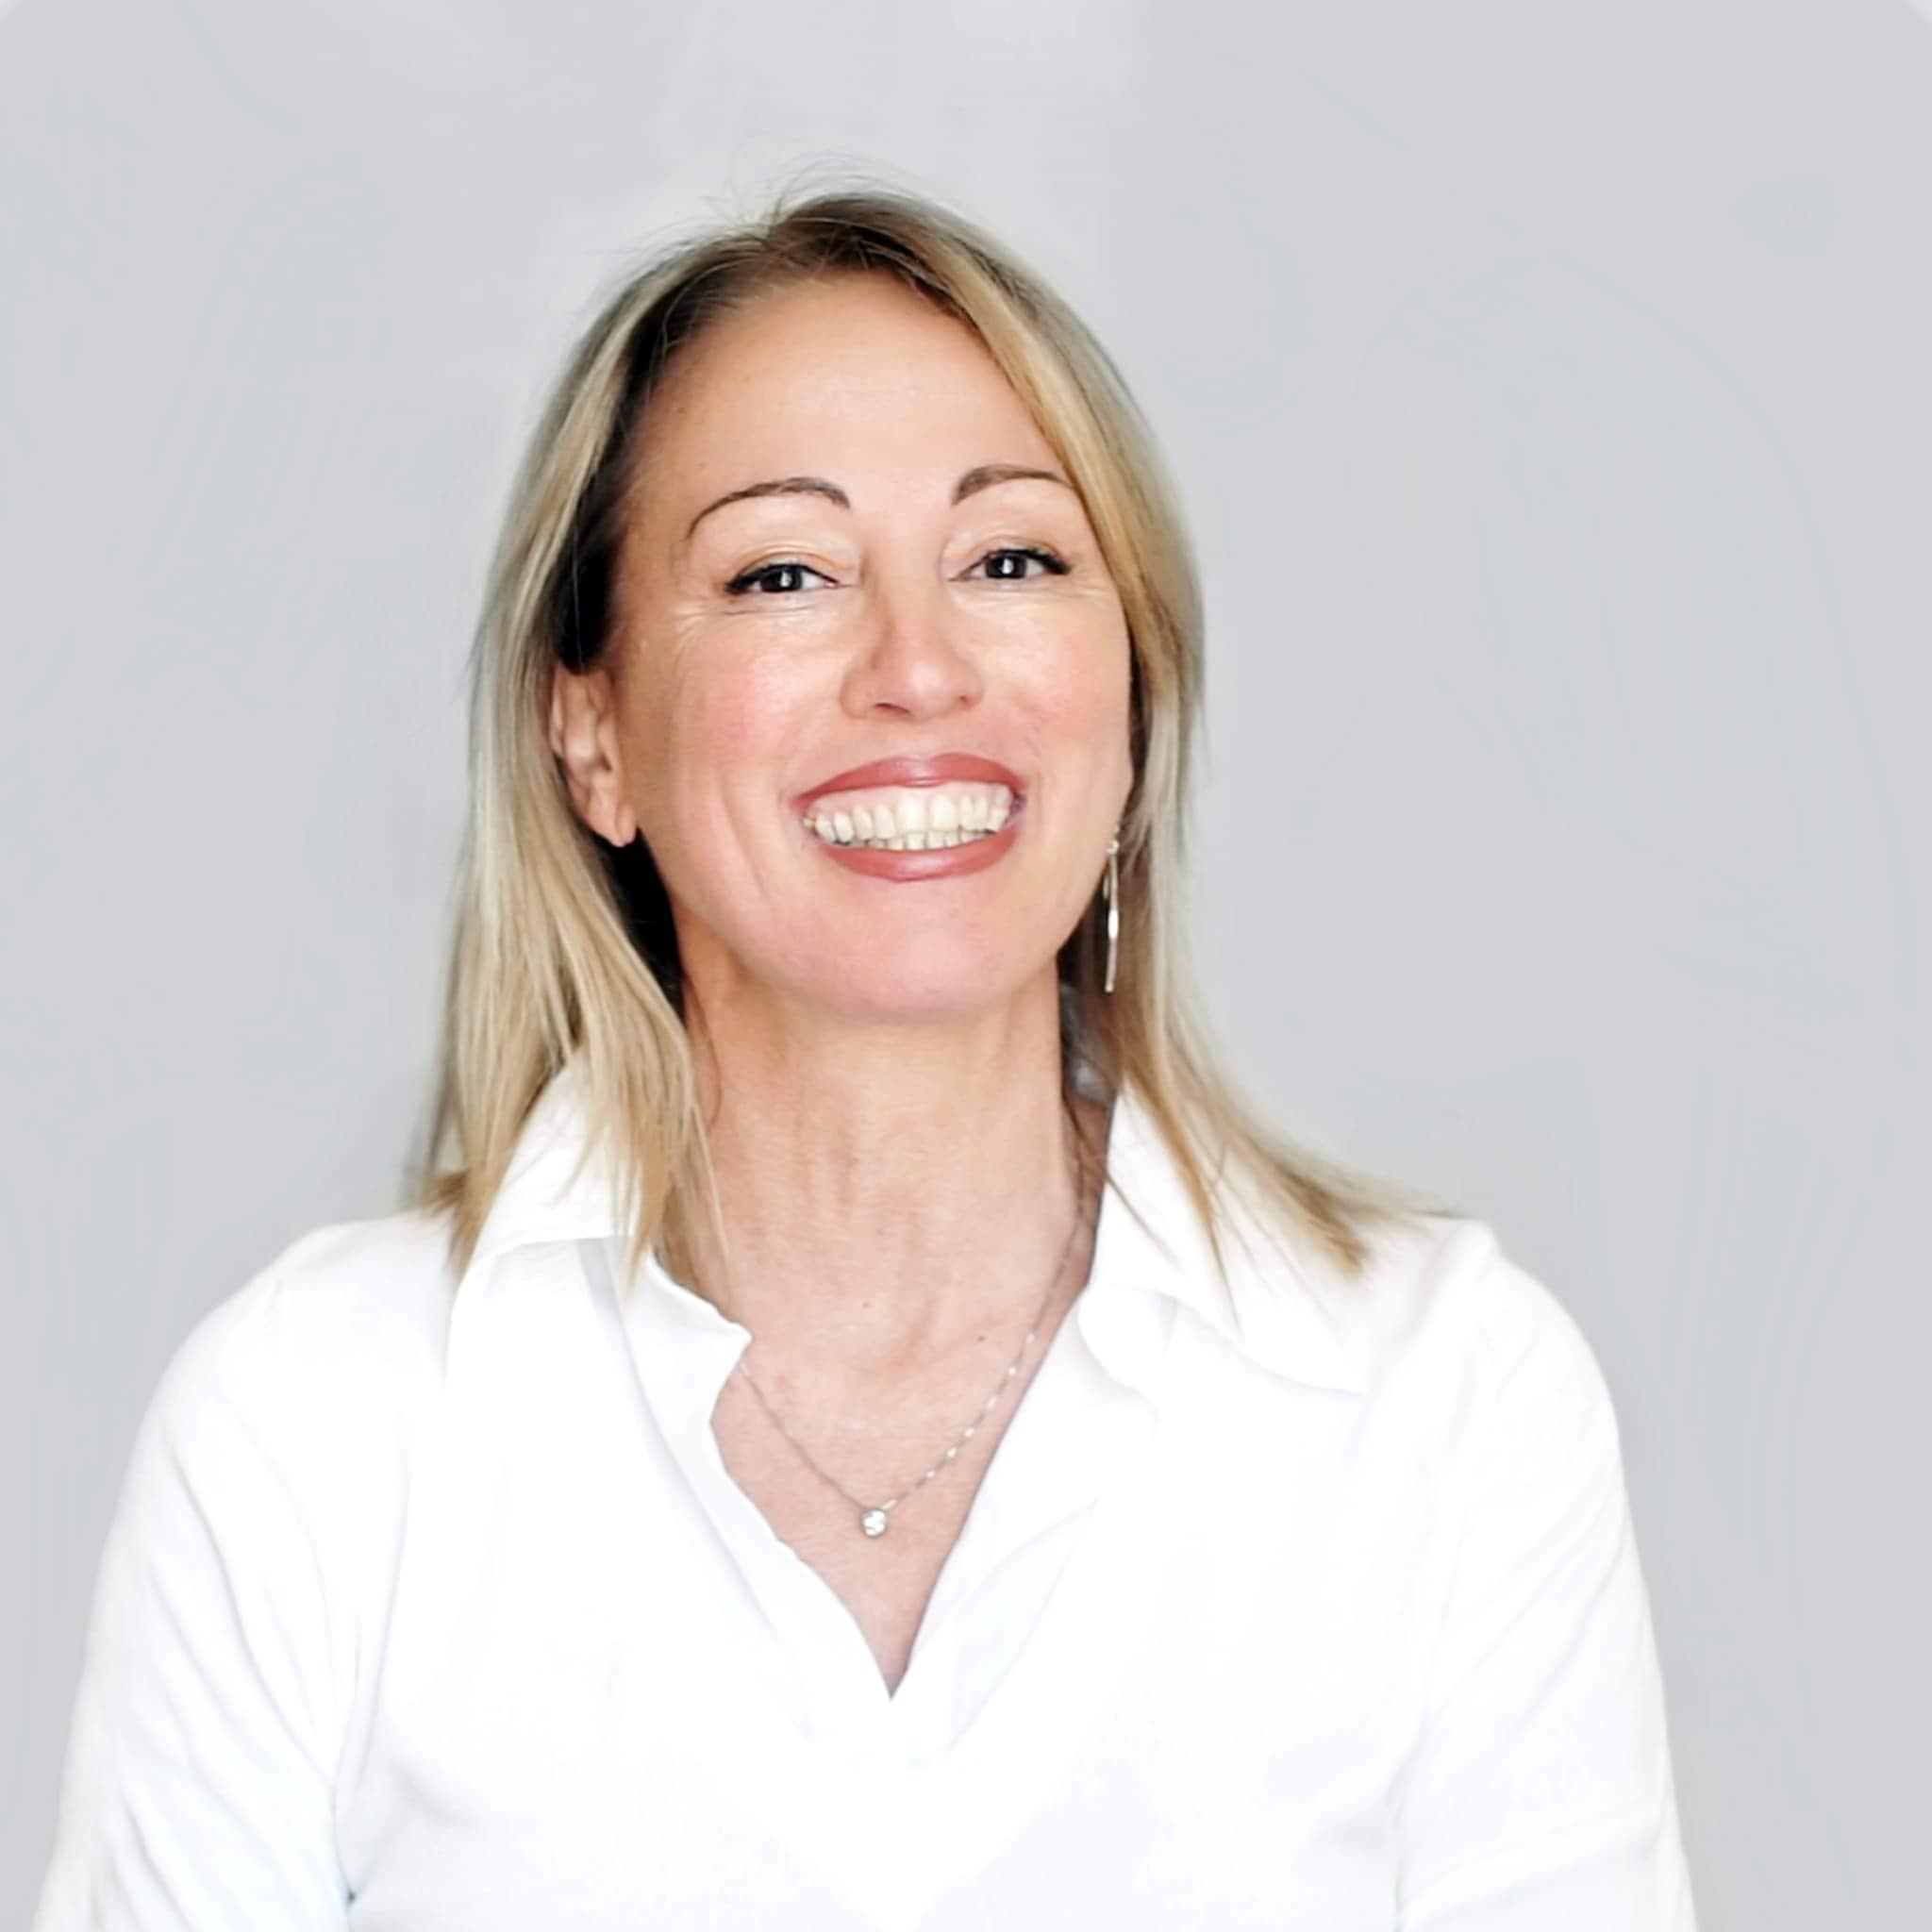 Martina Bindi bsoul cosmetici naturali